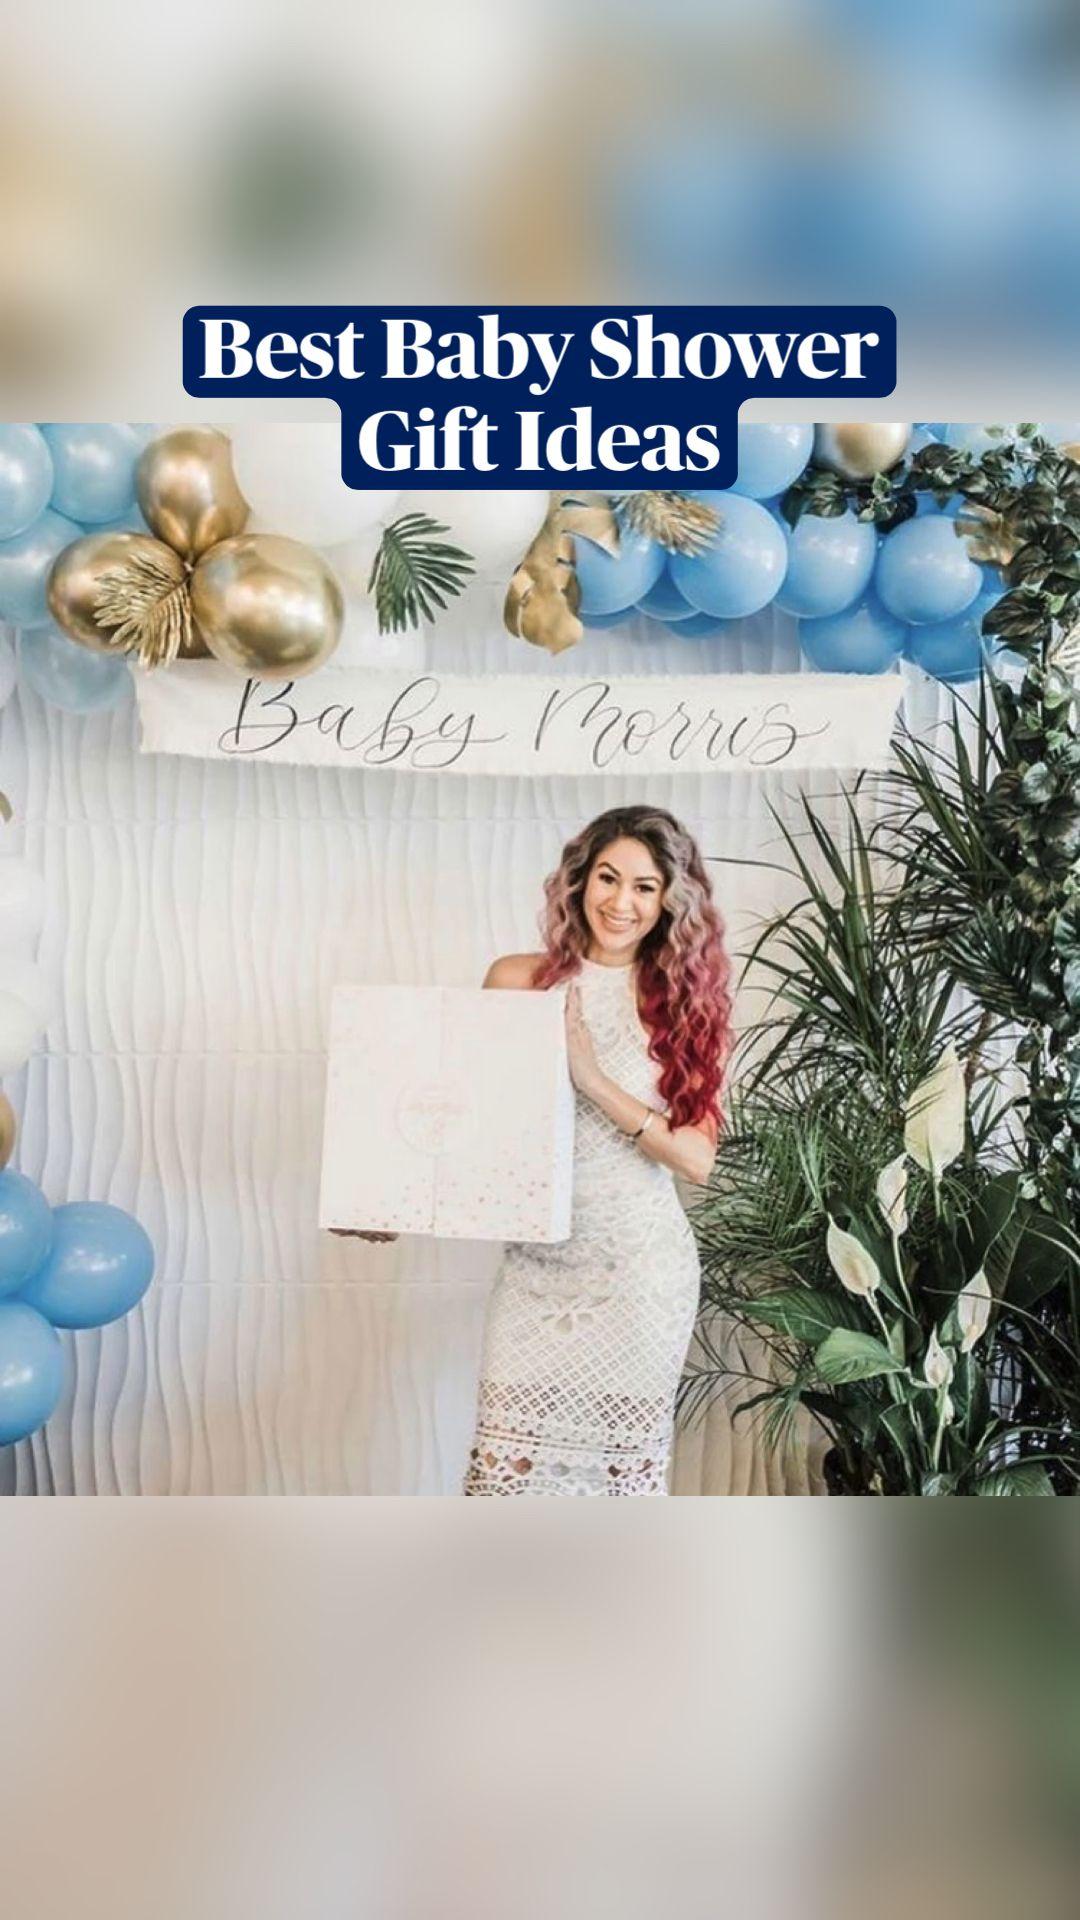 Best Baby Shower Gift Ideas - Baby Gift Box